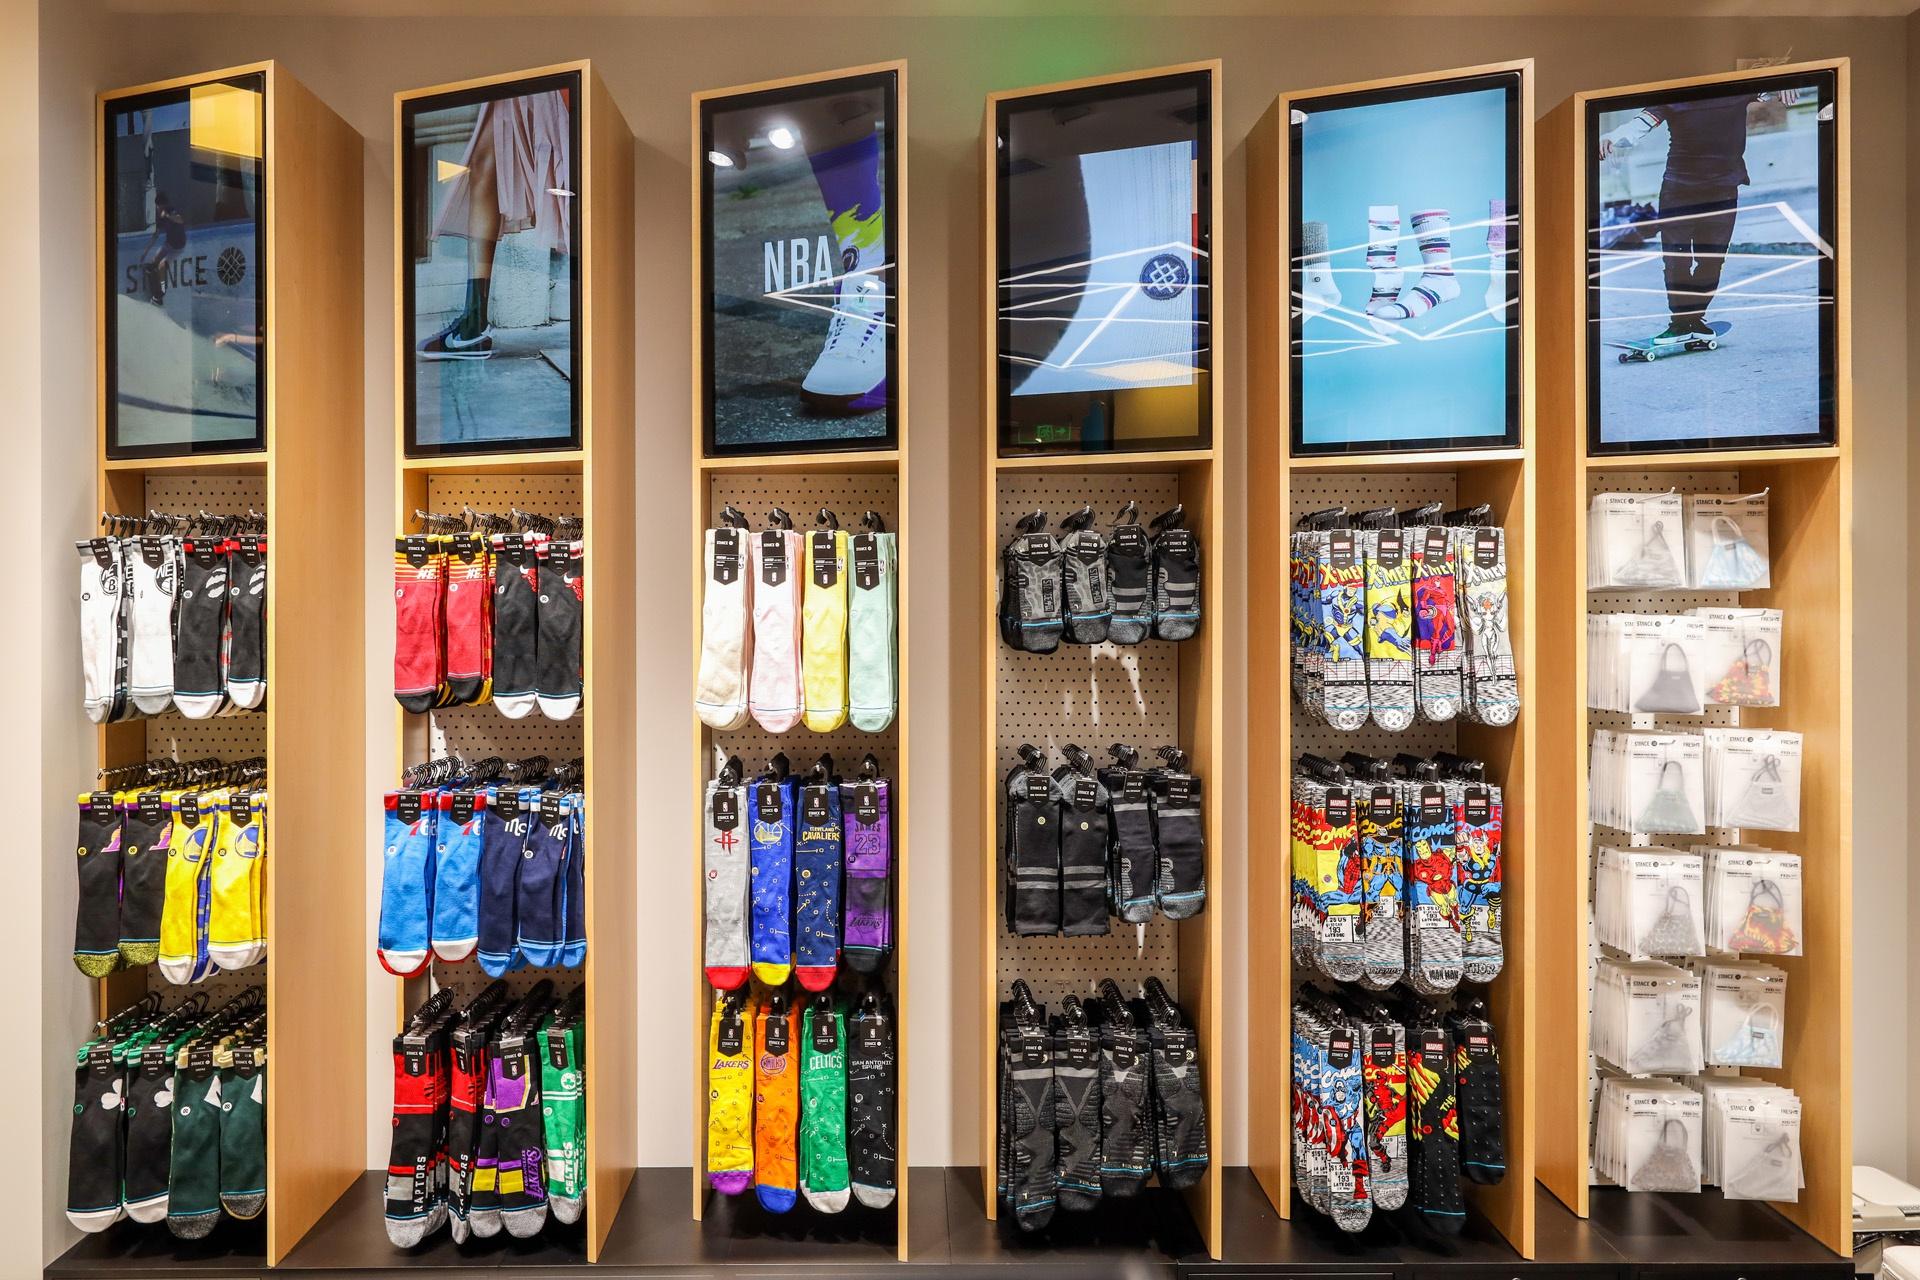 STANCE首家品牌体验店登陆上海港汇恒隆广场袜子潮流可以更精彩